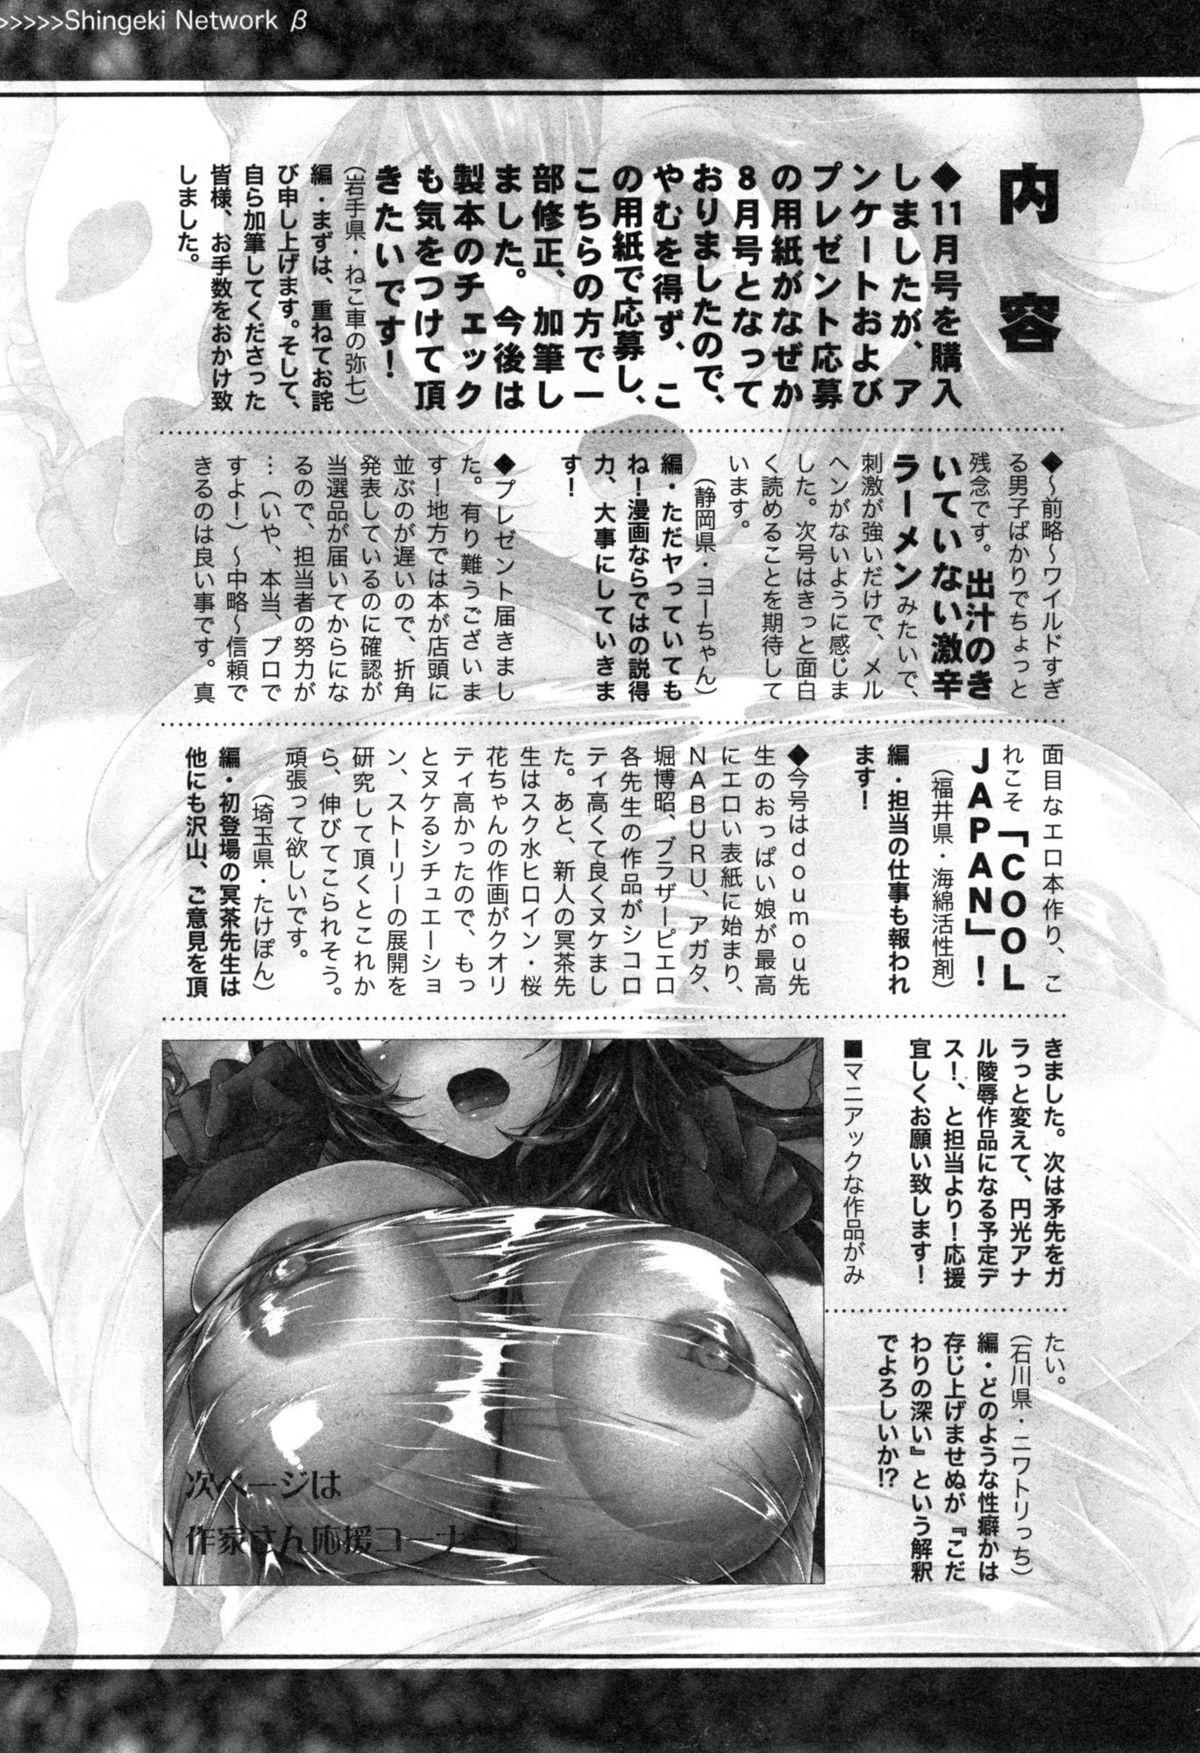 COMIC Shingeki 2015-01 352